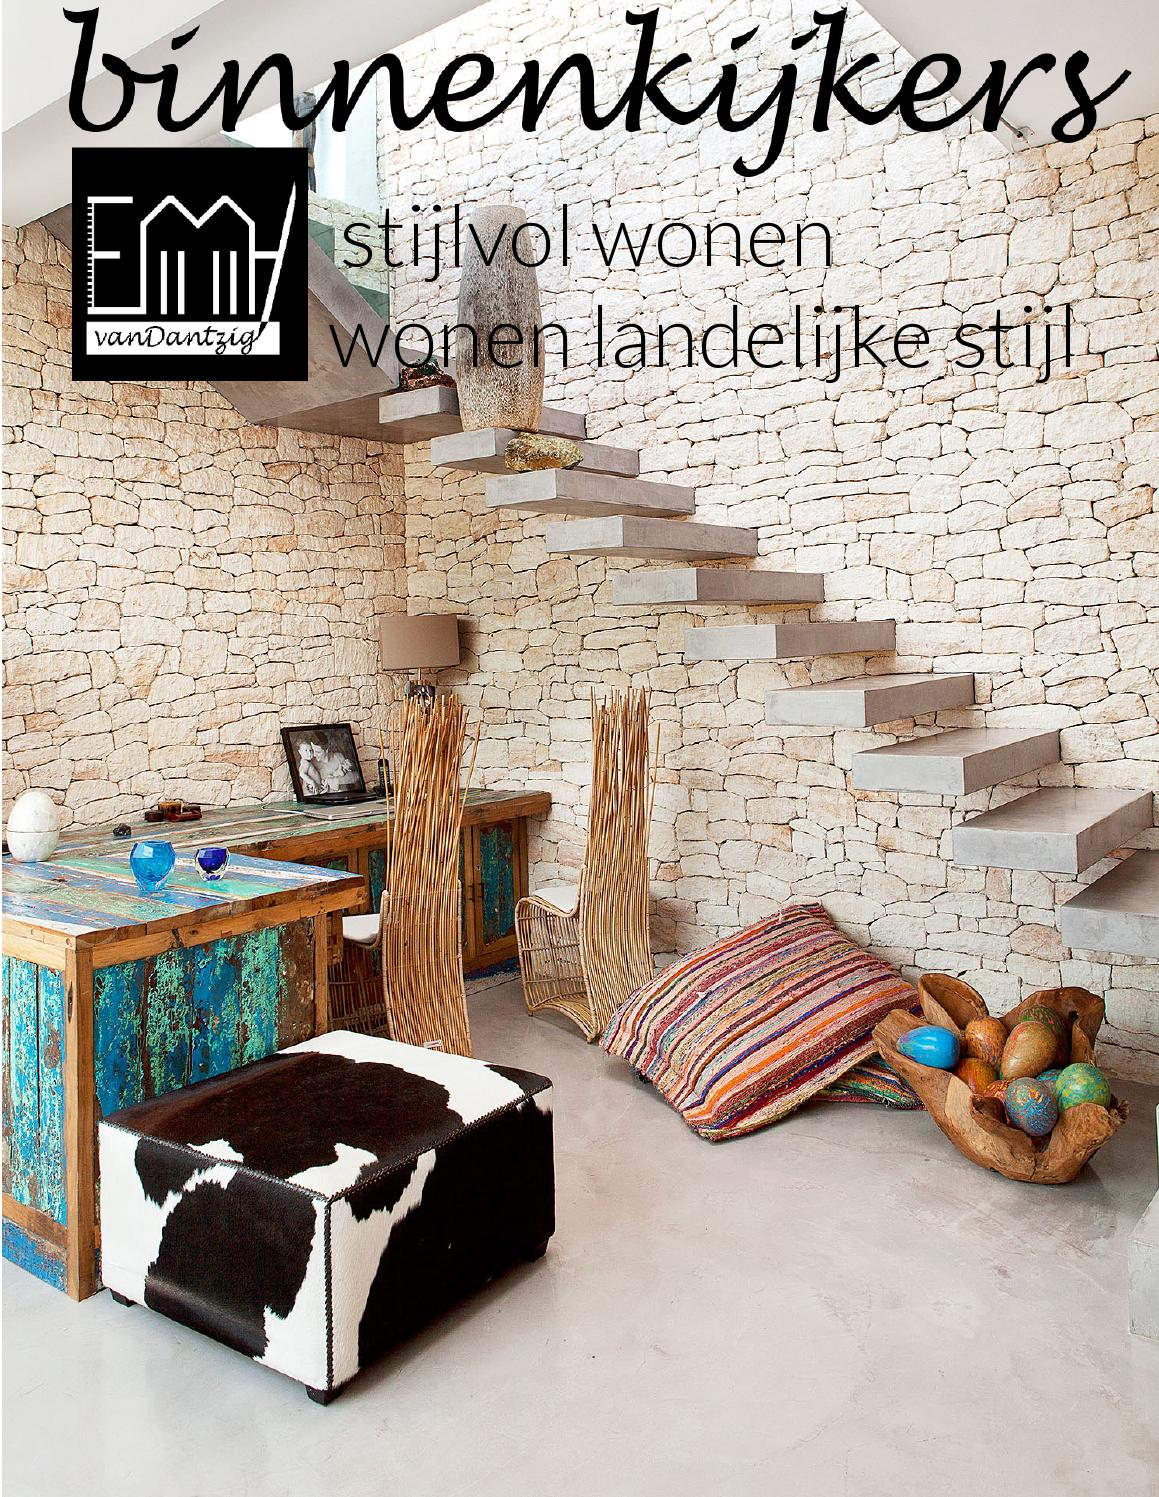 Fokus Mijn Tuin by Smart Media BE - issuu